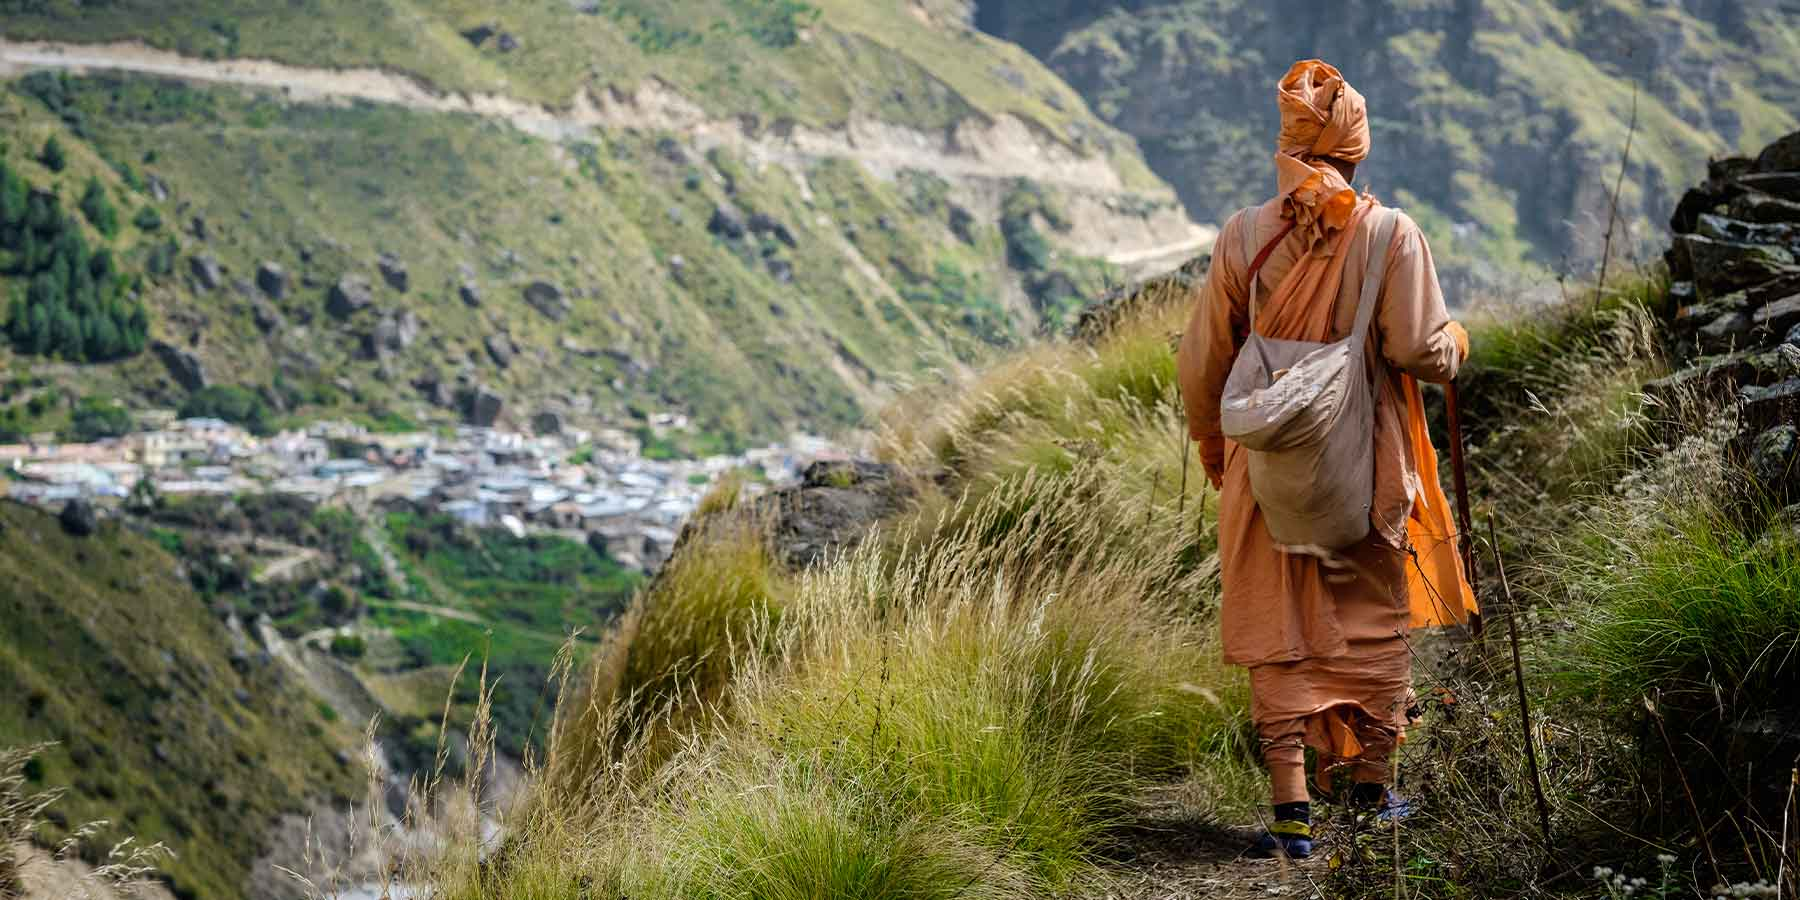 Guru teaches autonomy not submission